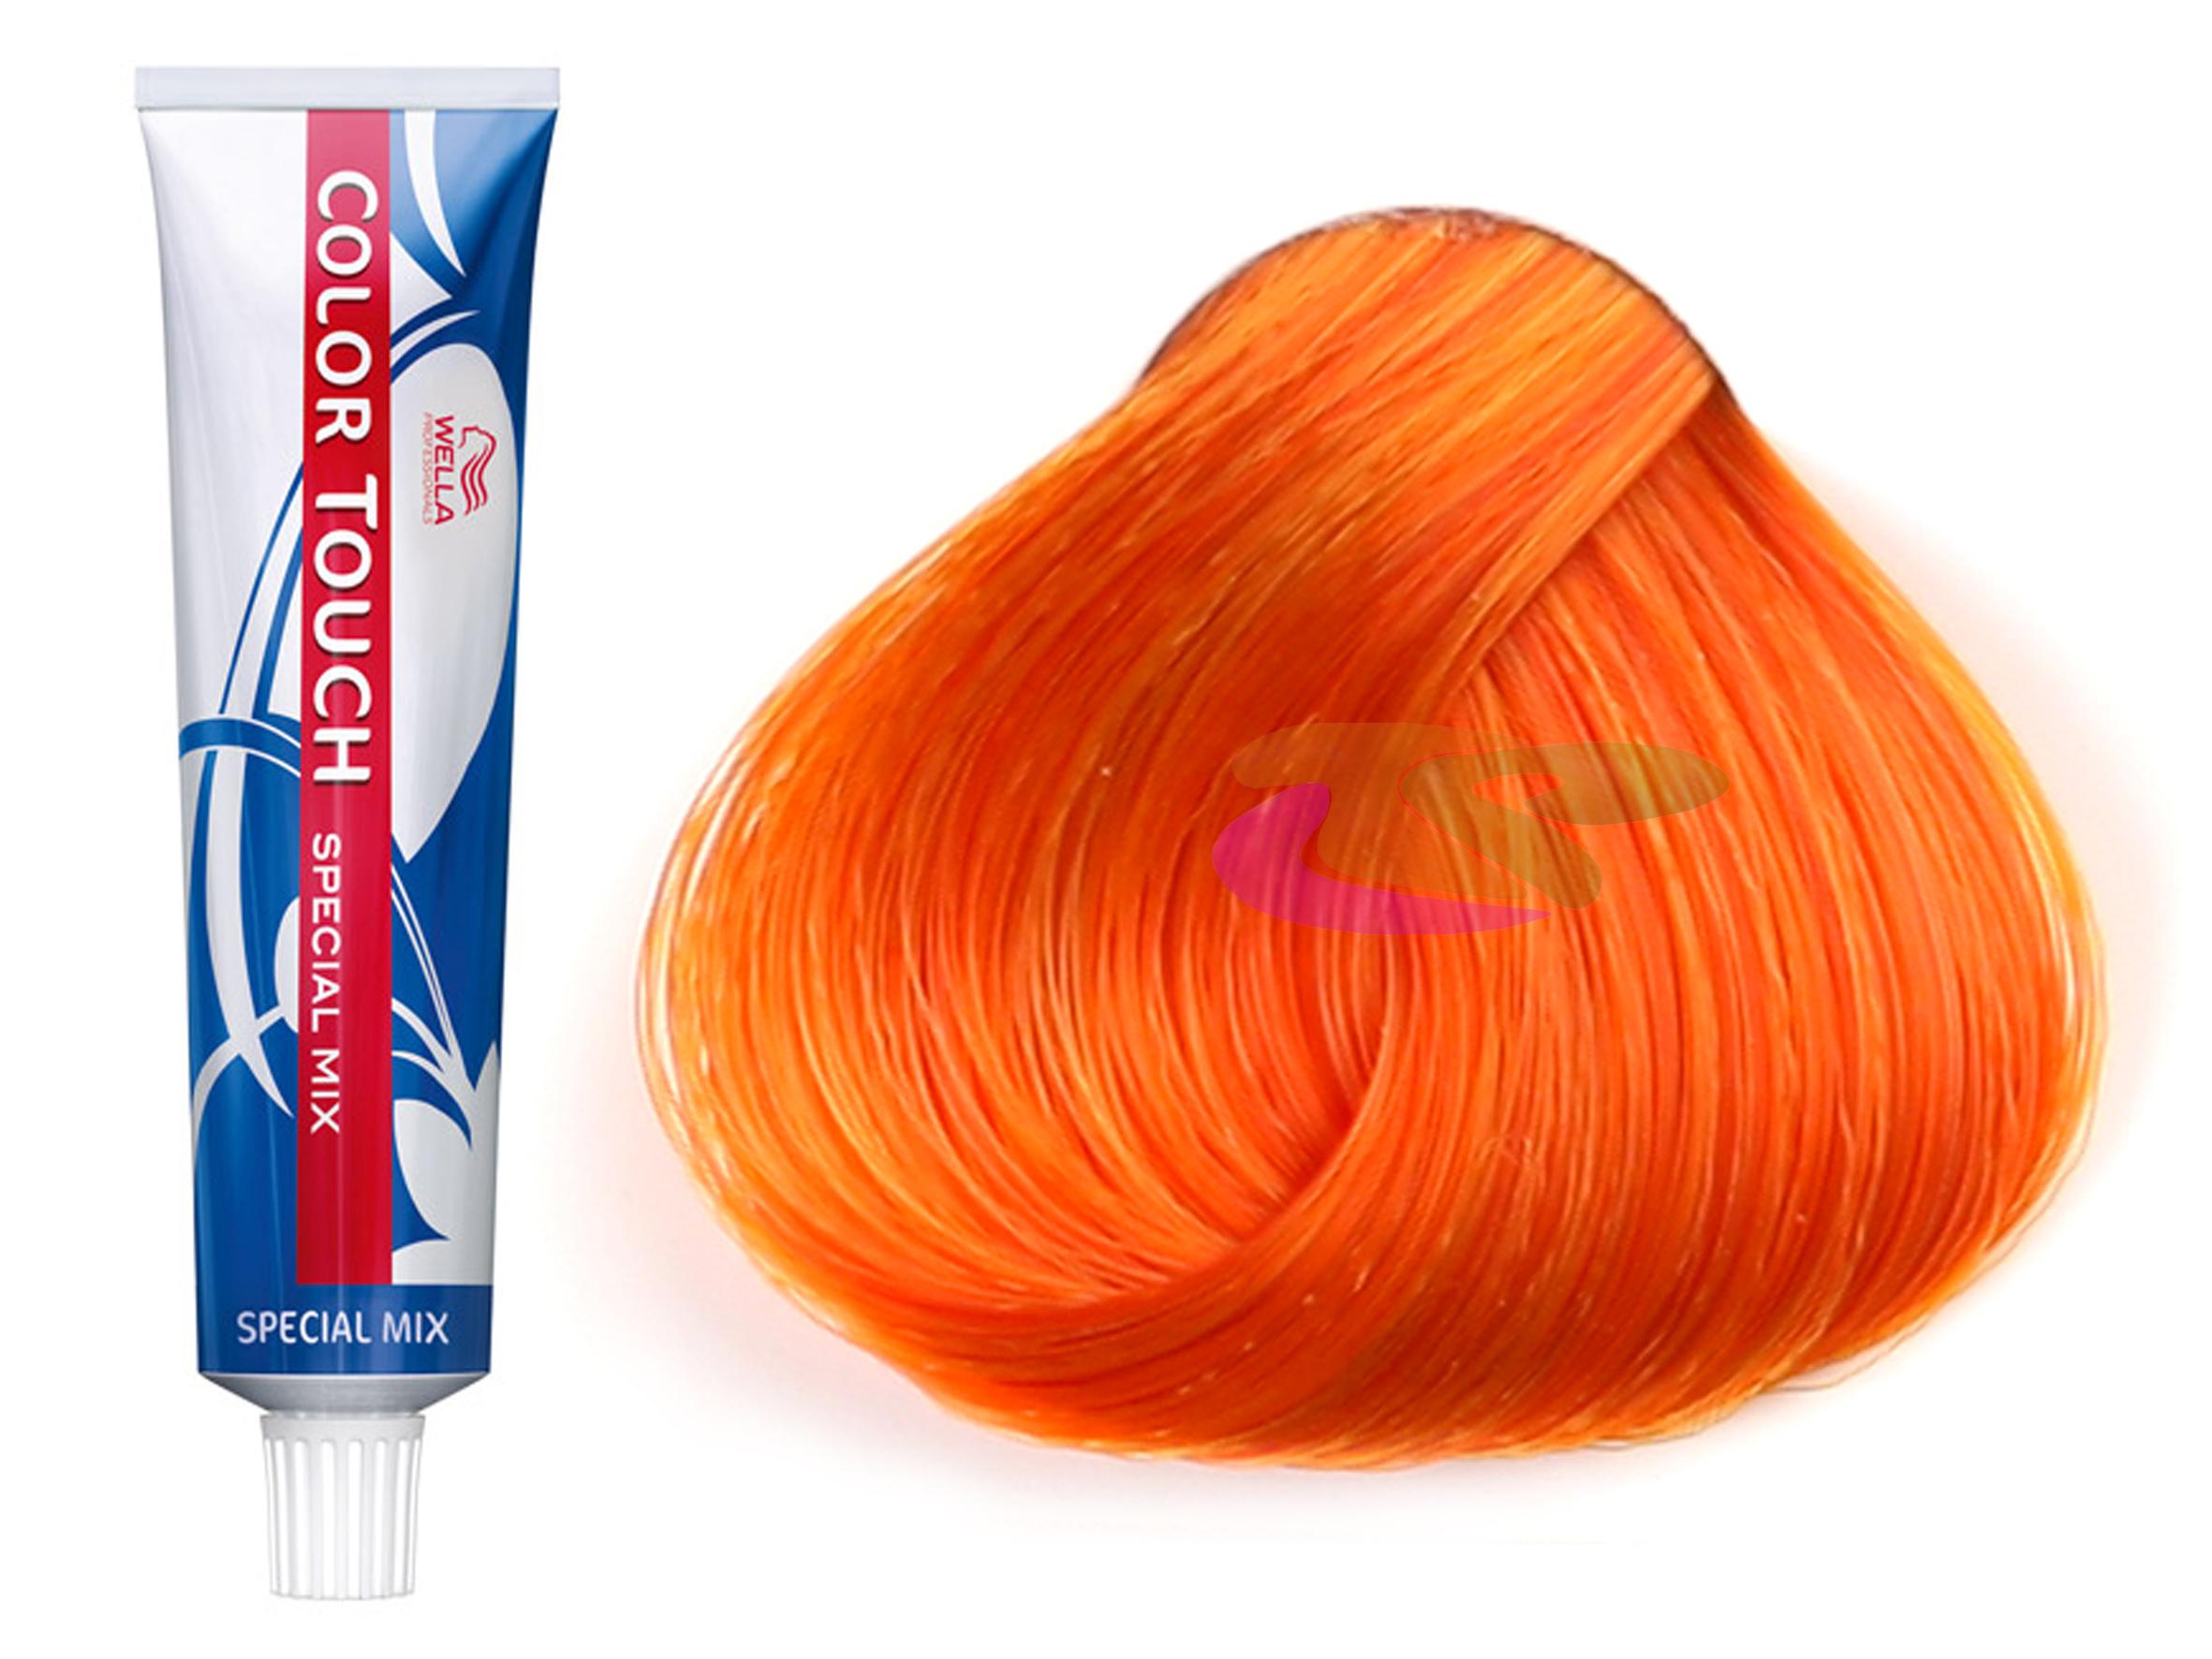 wella bao de color semipermanente color touch special mix intensificador 034 - Wella Color Touch Special Mix